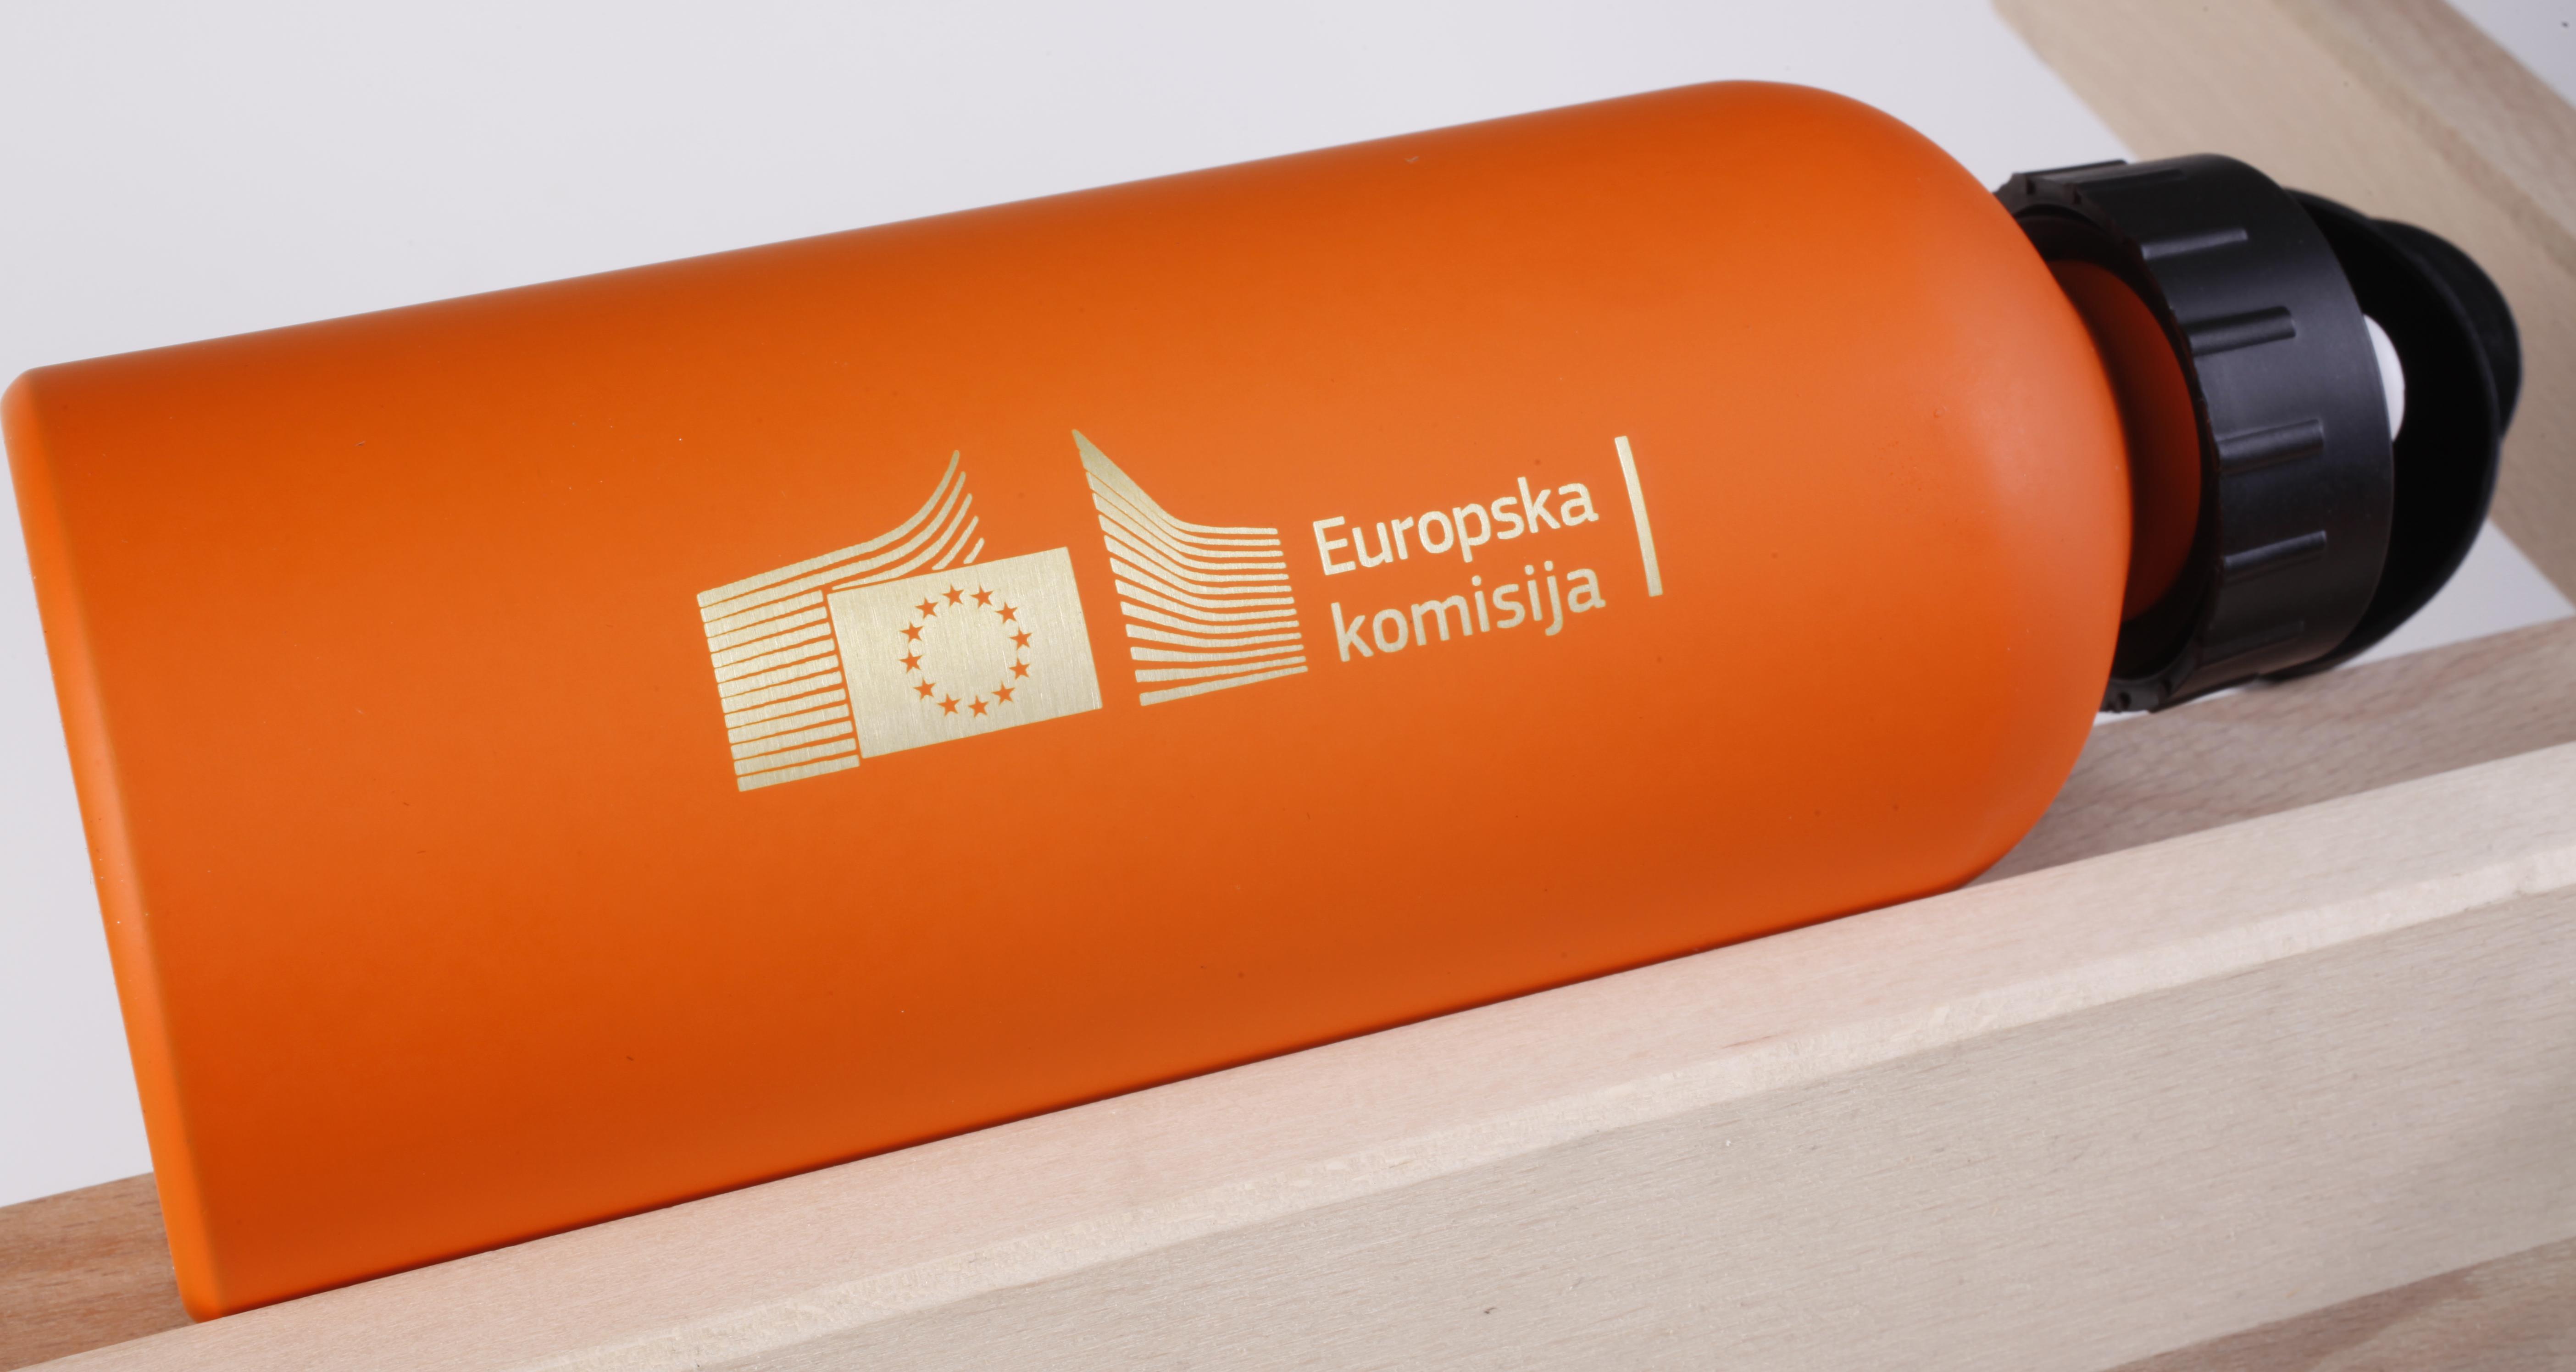 Europska komisija promo 4